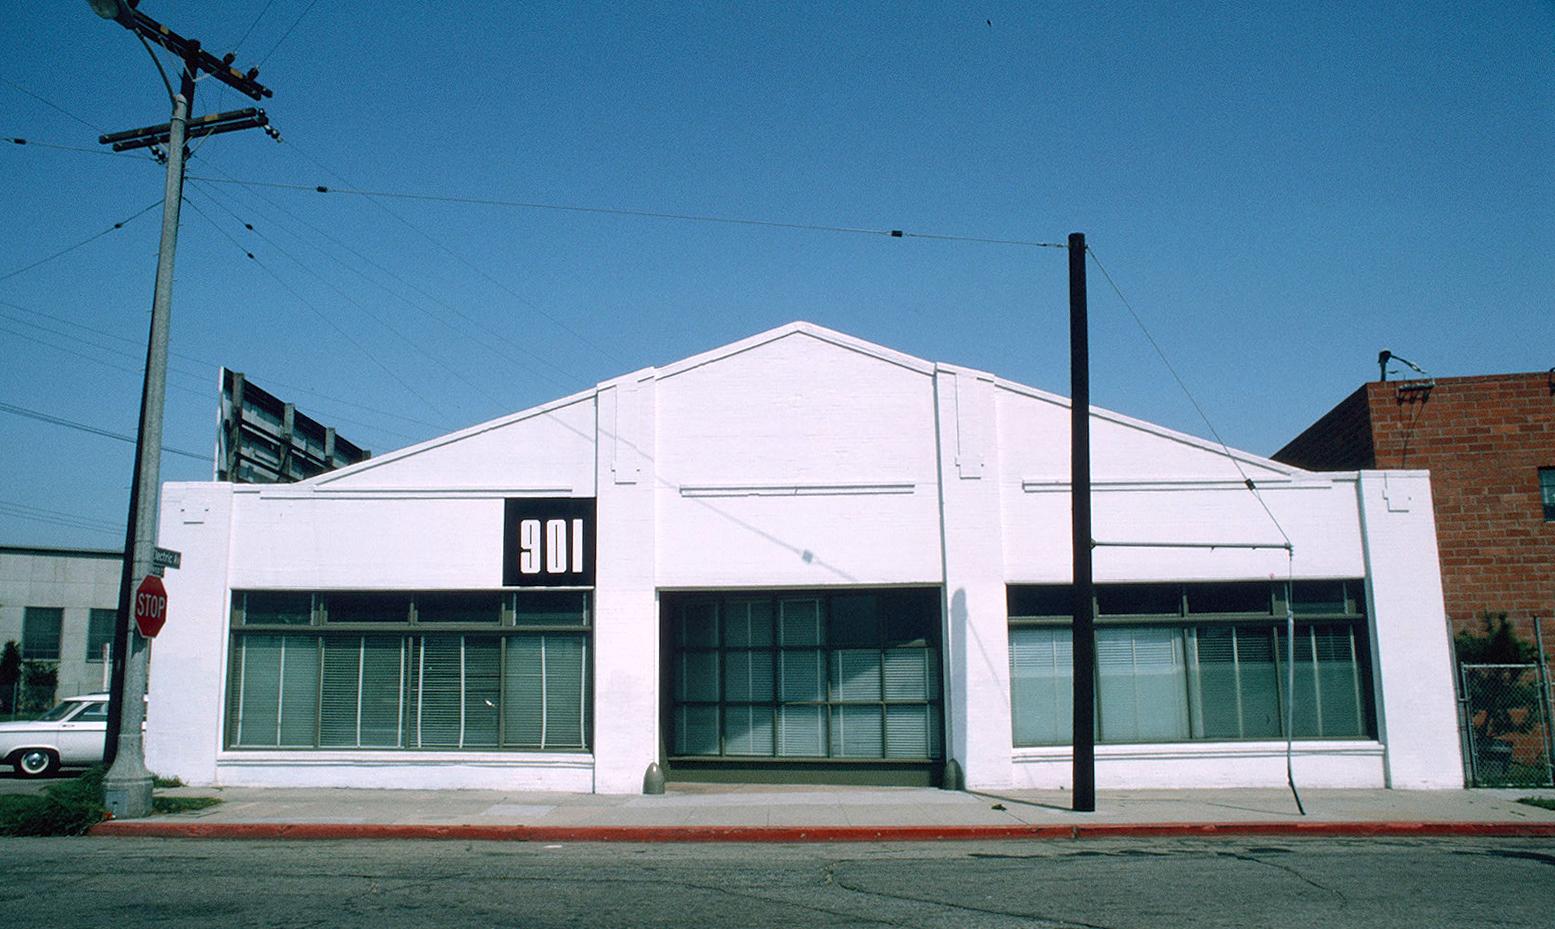 Dan-Wynn_Eames-Studio-Los-Angeles_5-1-75_0001.jpg